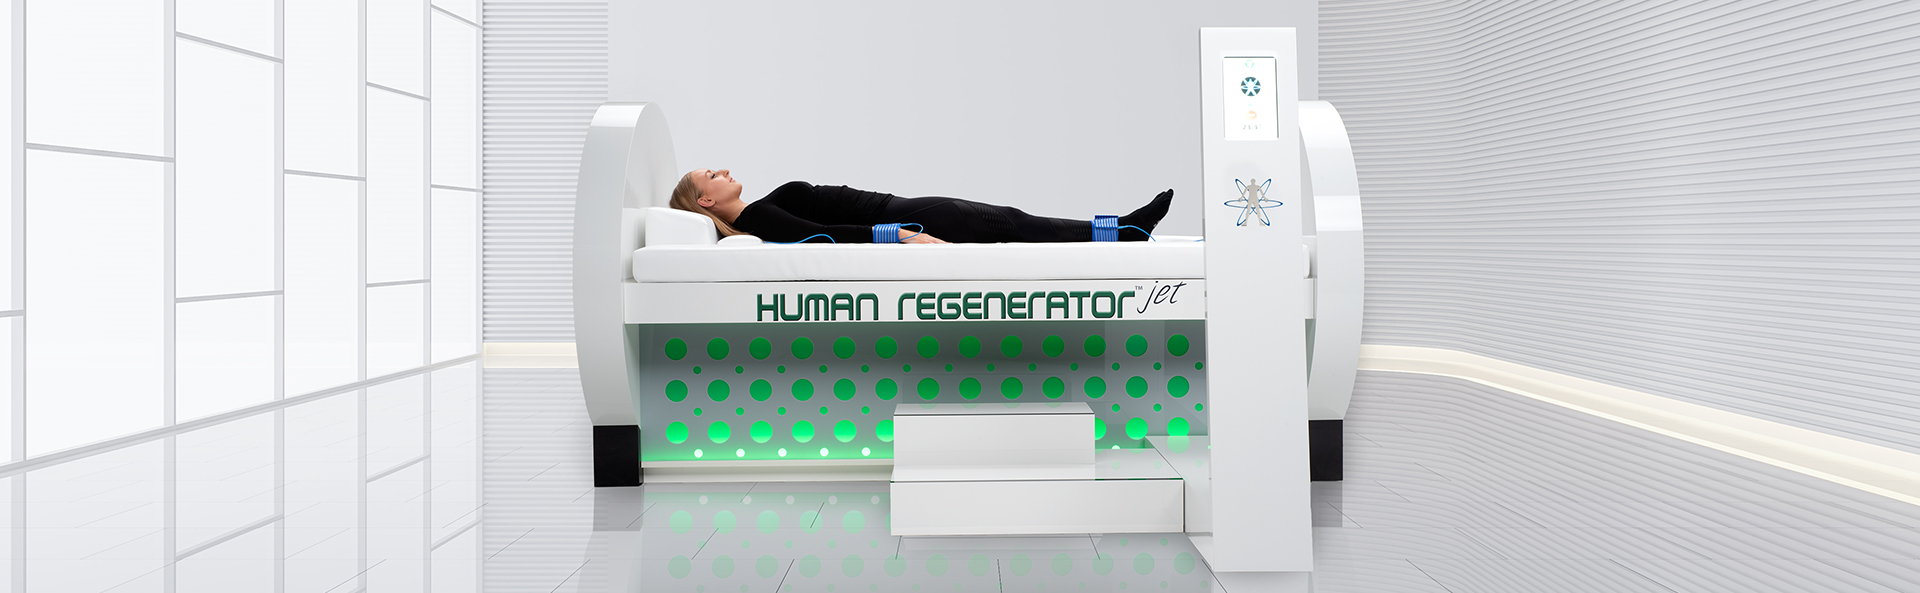 Human Regenerator Jet Regenerate Cells